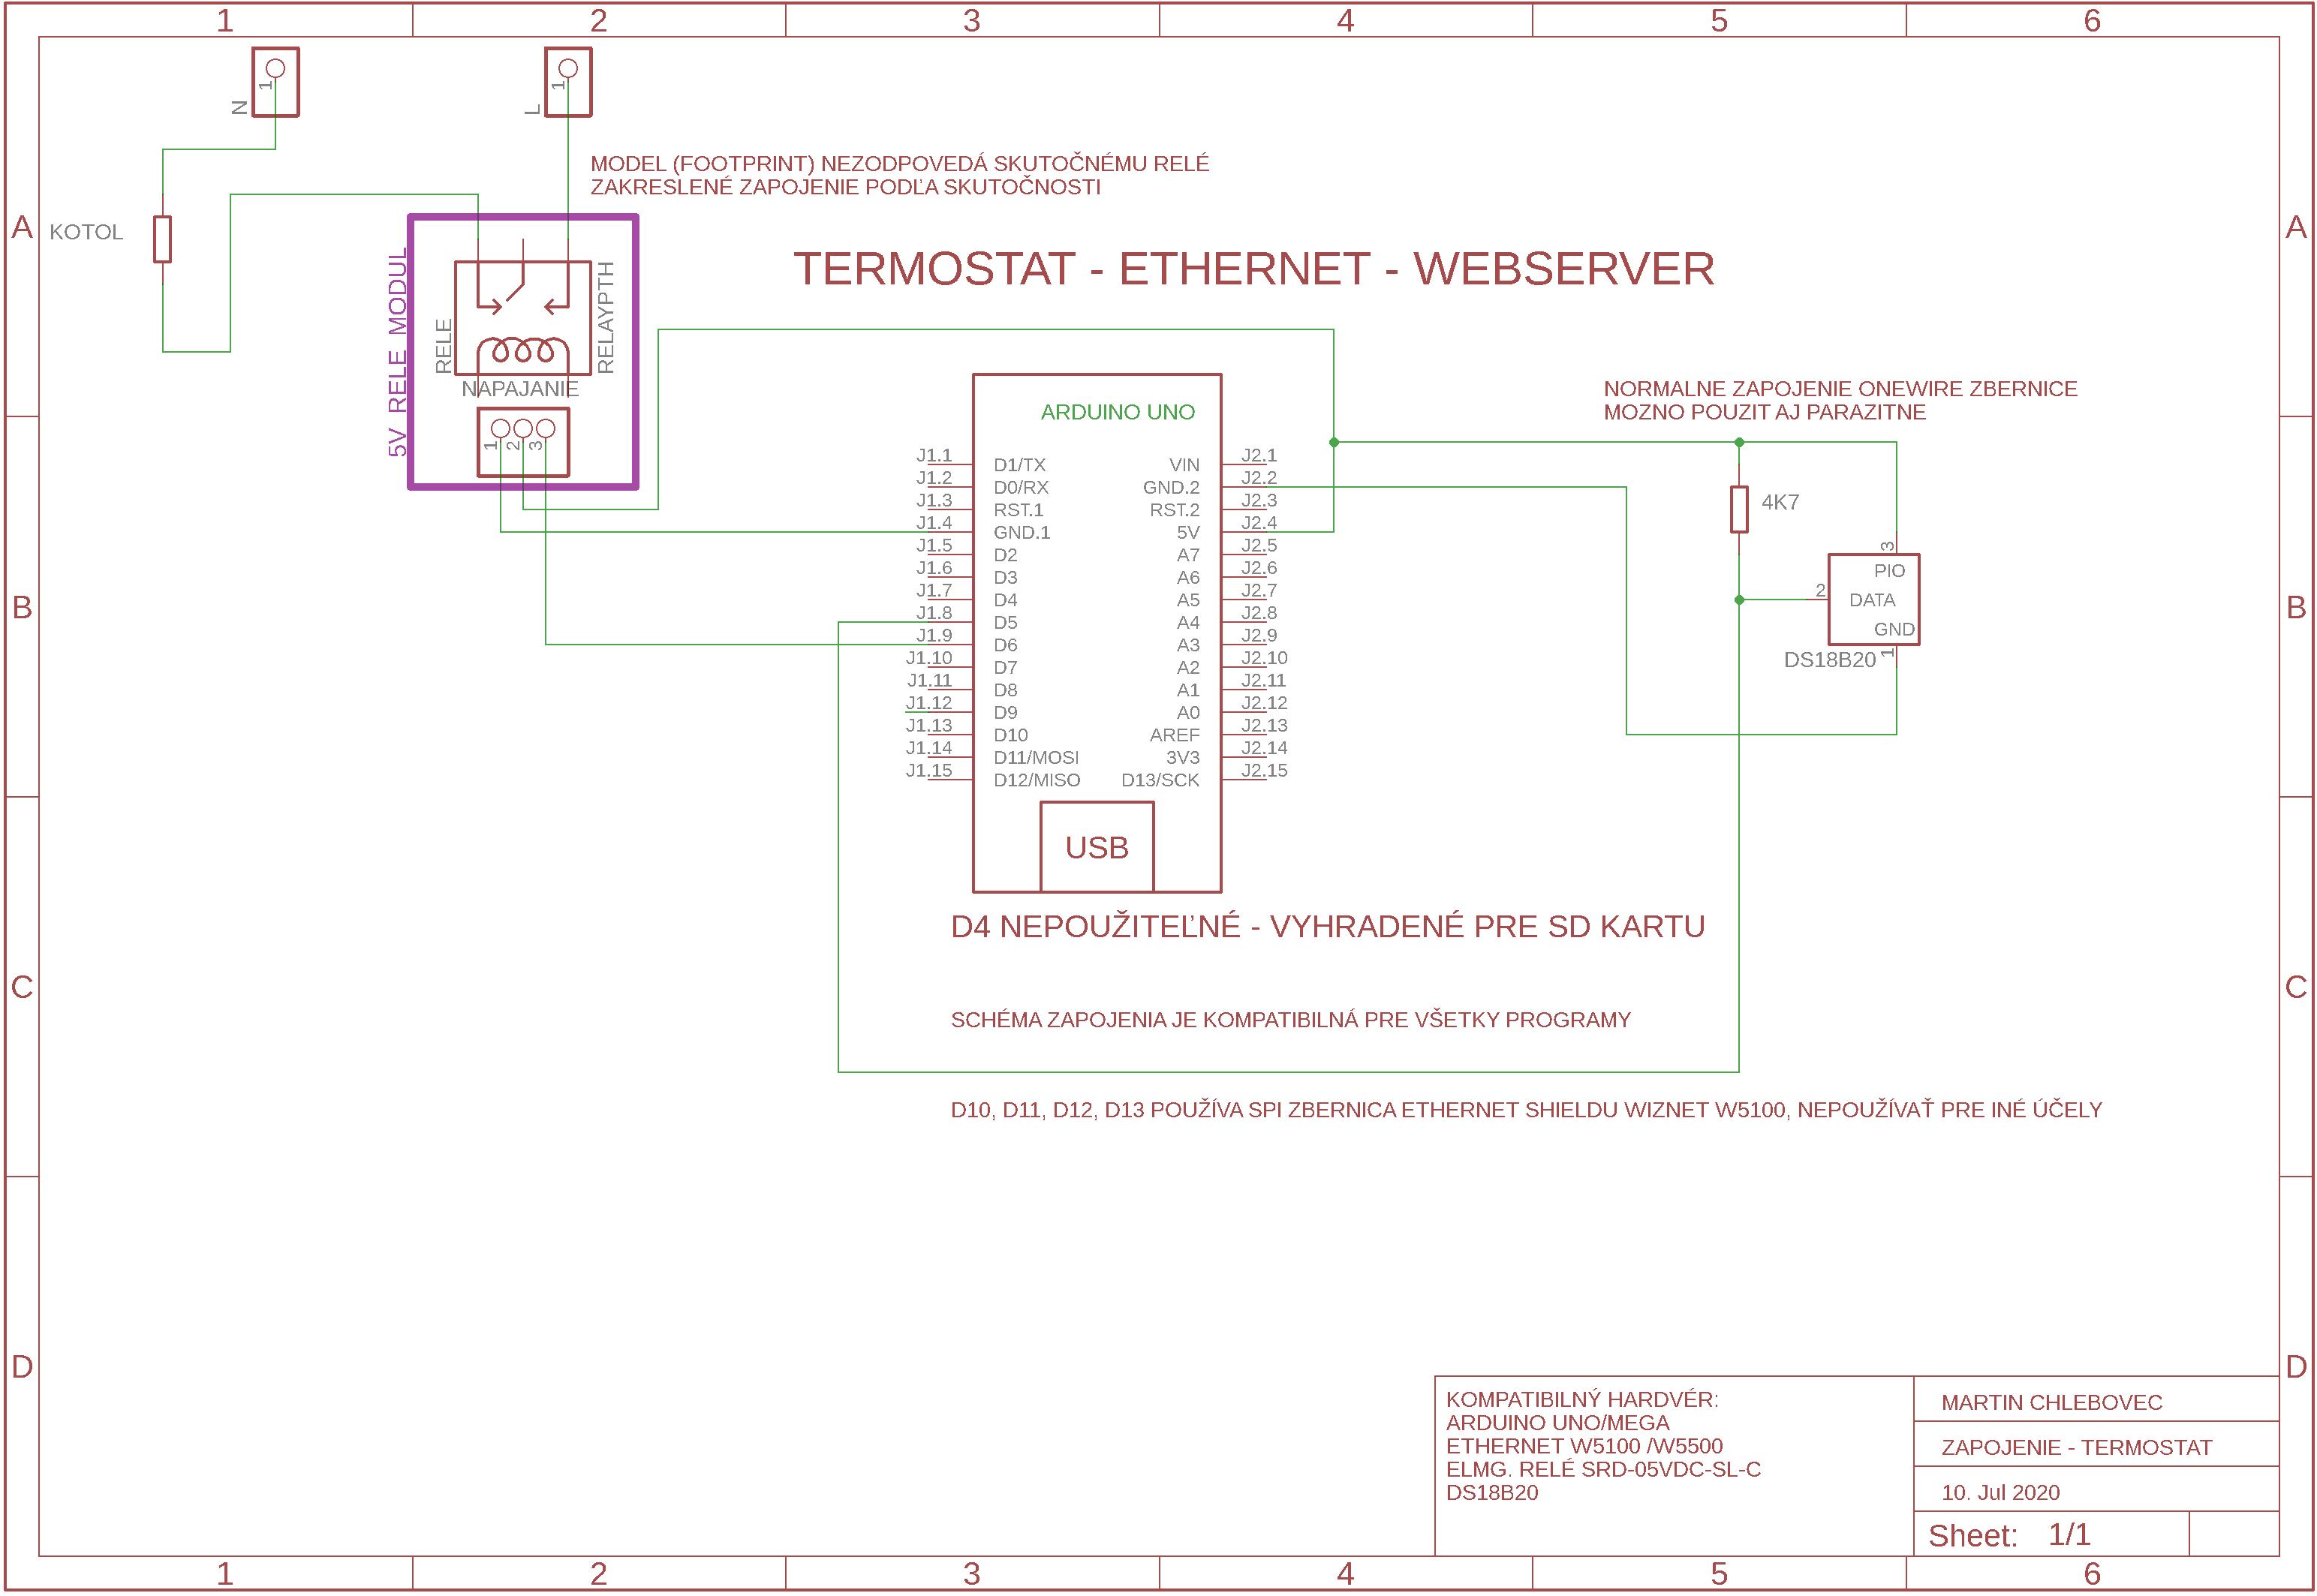 Termostat - Arduino + Ethernet W5100 - 恒温器-Arduino+以太网W5100